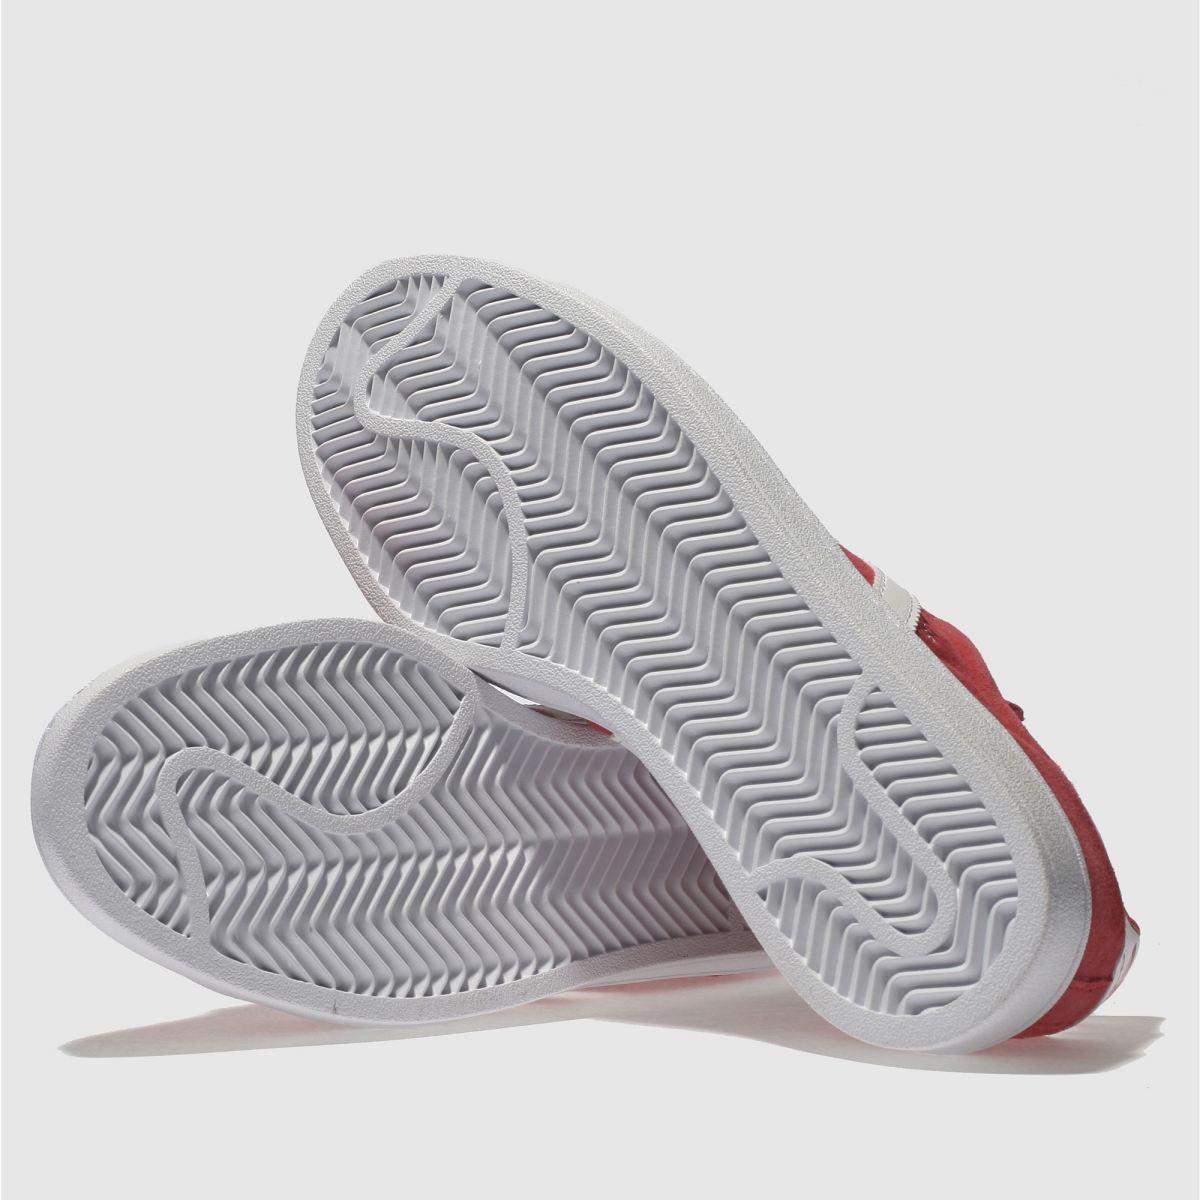 Damen Rot adidas Campus Suede Sneaker | Schuhe schuh Gute Qualität beliebte Schuhe | 81b9ff